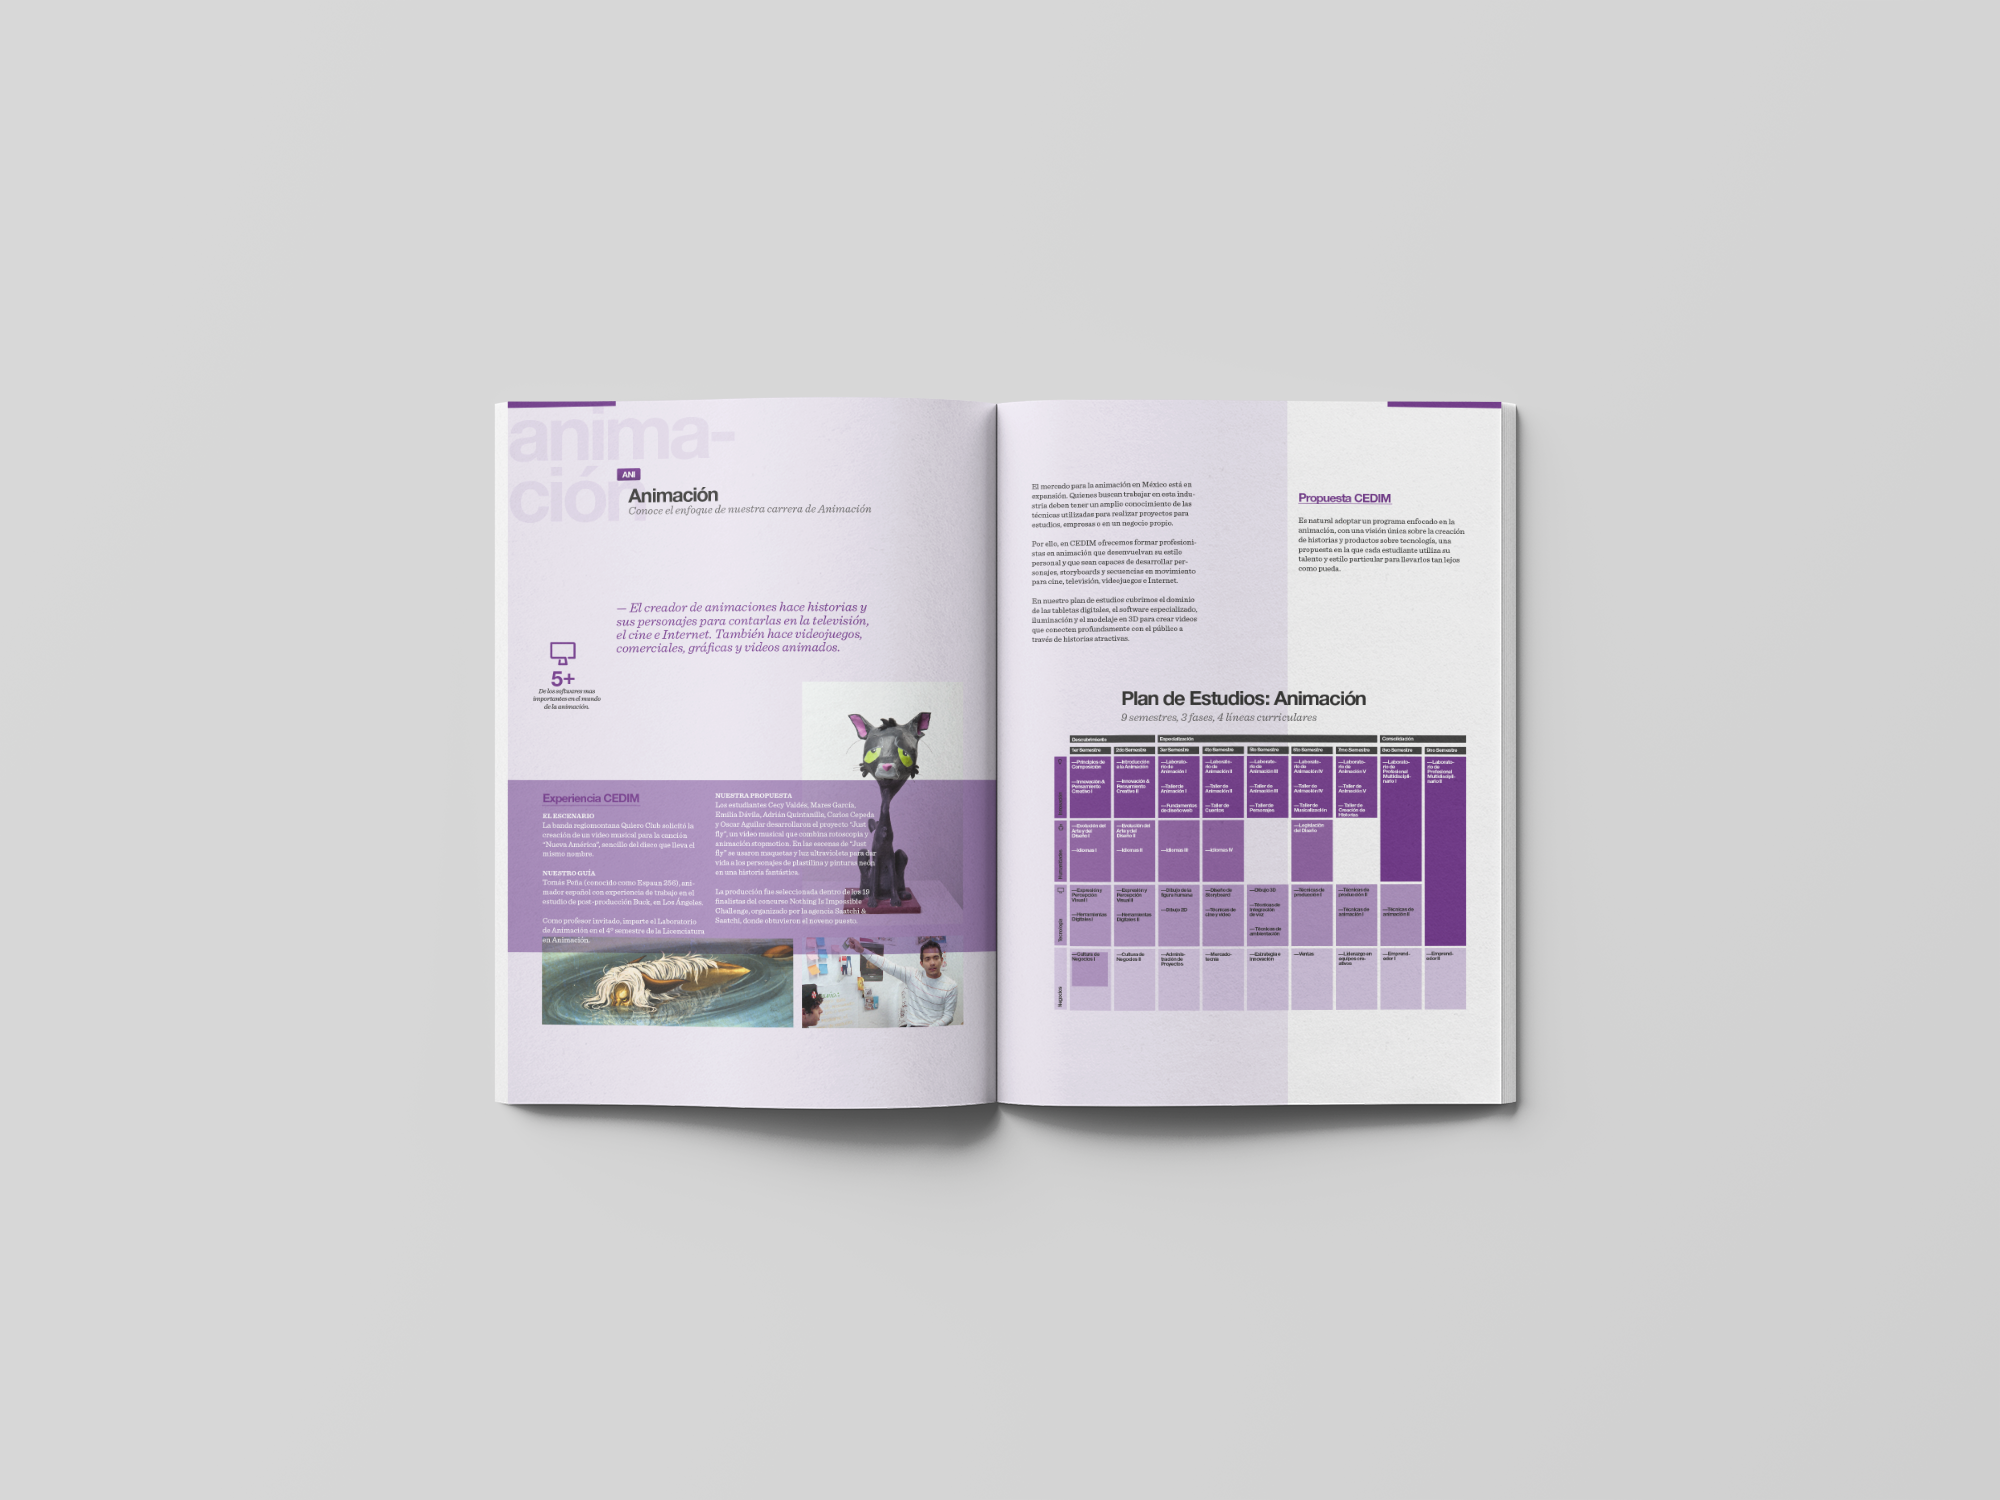 spread06-cedim-brochure-yoenpaperland